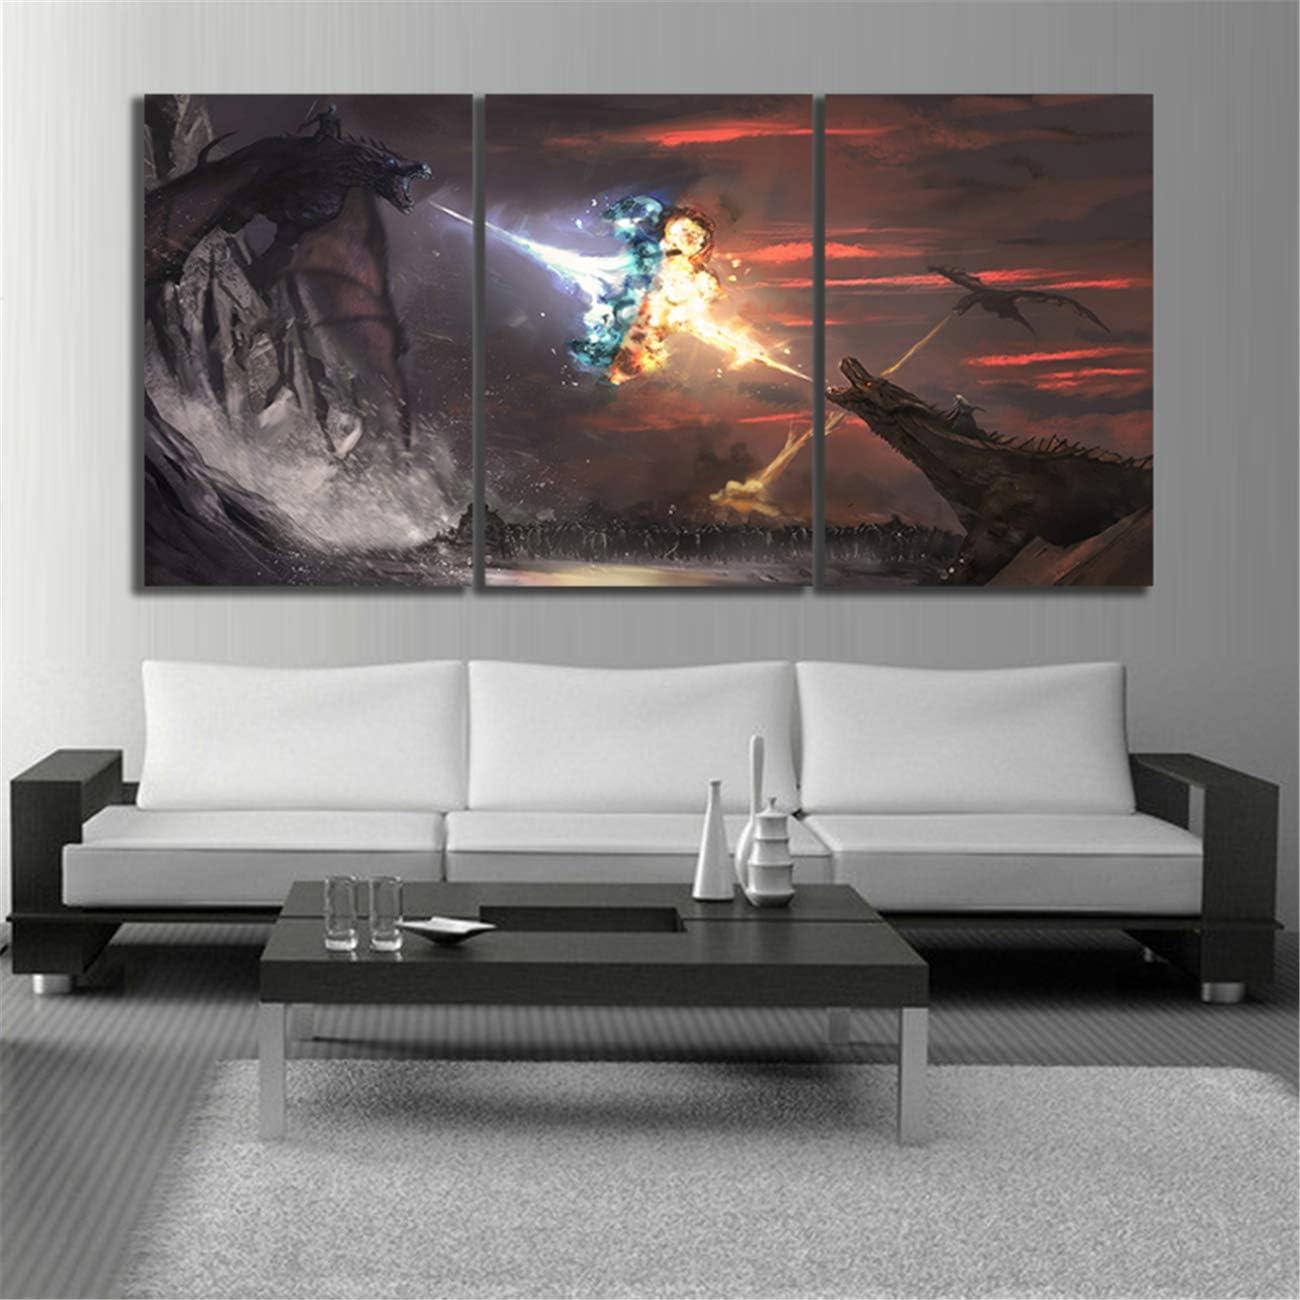 OfinaBiz How to Train Your Dragon 3 Modern Wall Decor 5 Piece Painting HD Canvas Decorative Painting Home Sofa Background Decor Restaurant Poster Total 150 Cm X 80 Cm (Ofi927)